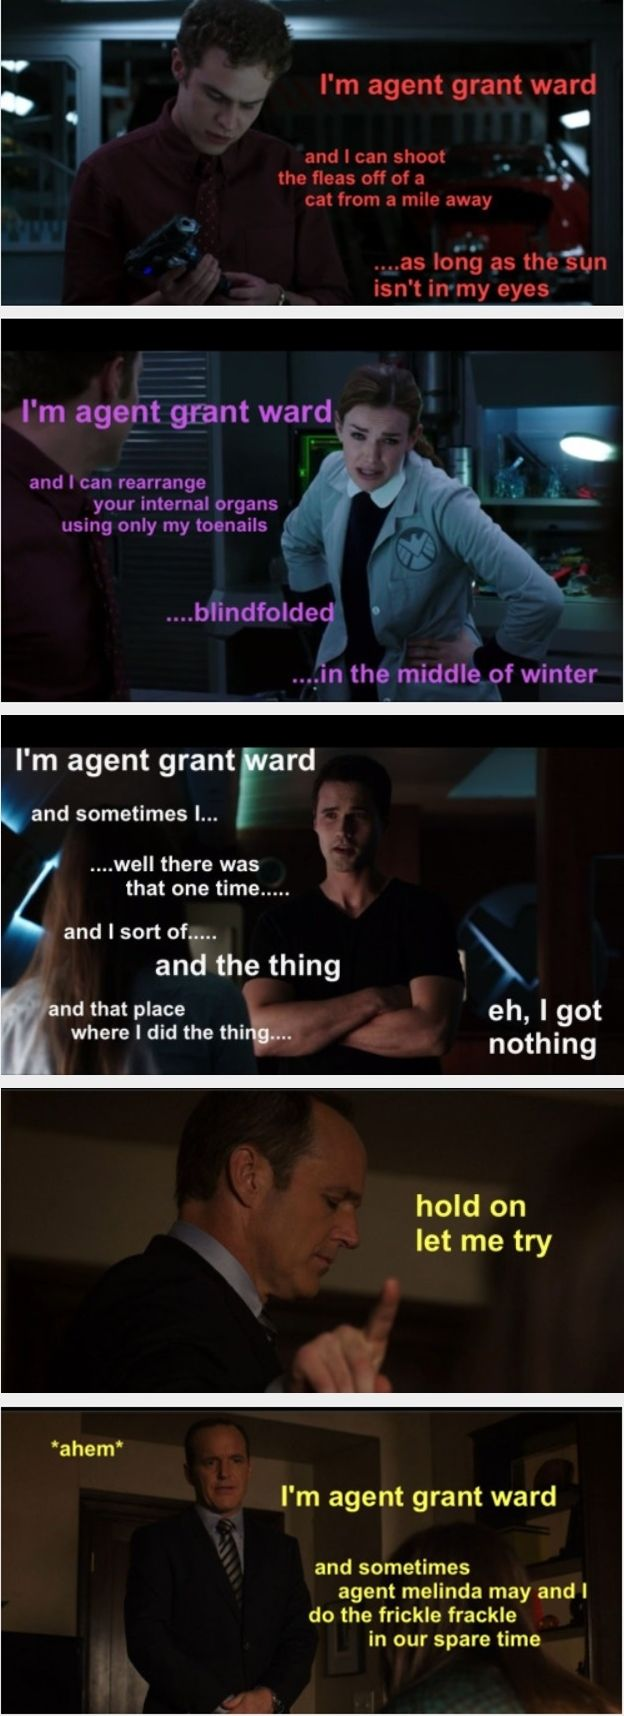 Agents of S.H.I.E.L.D. team.  brett dalton chloe bennet clark gregg elizabeth henstridge grant ward iain de caestecker jemma simmons leo fitz melinda may ming-na wen phil coulson skye